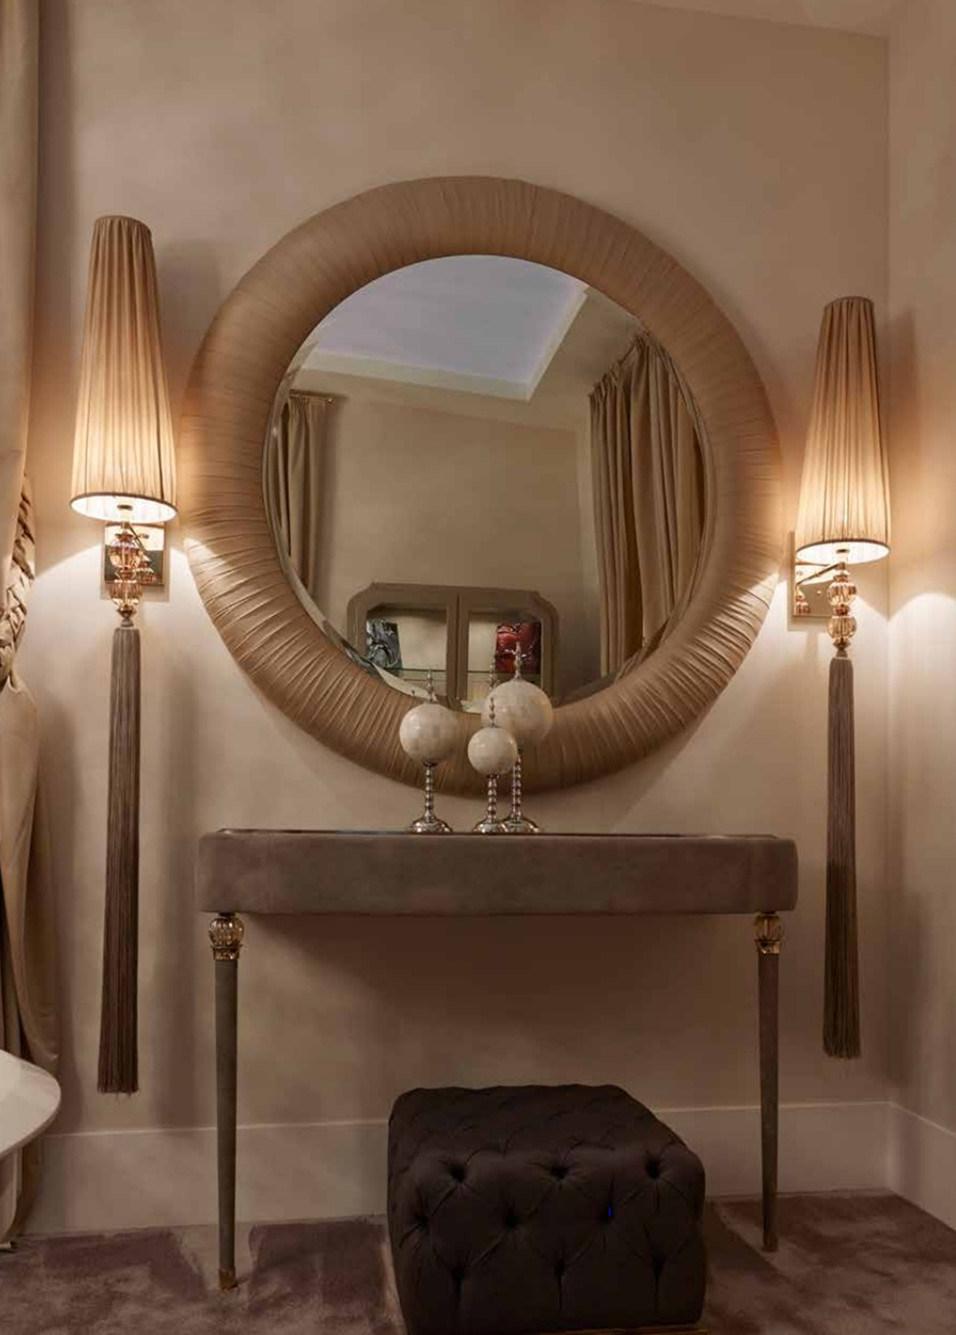 Hotel Project Room Customized Wall Light (KA170301-3)